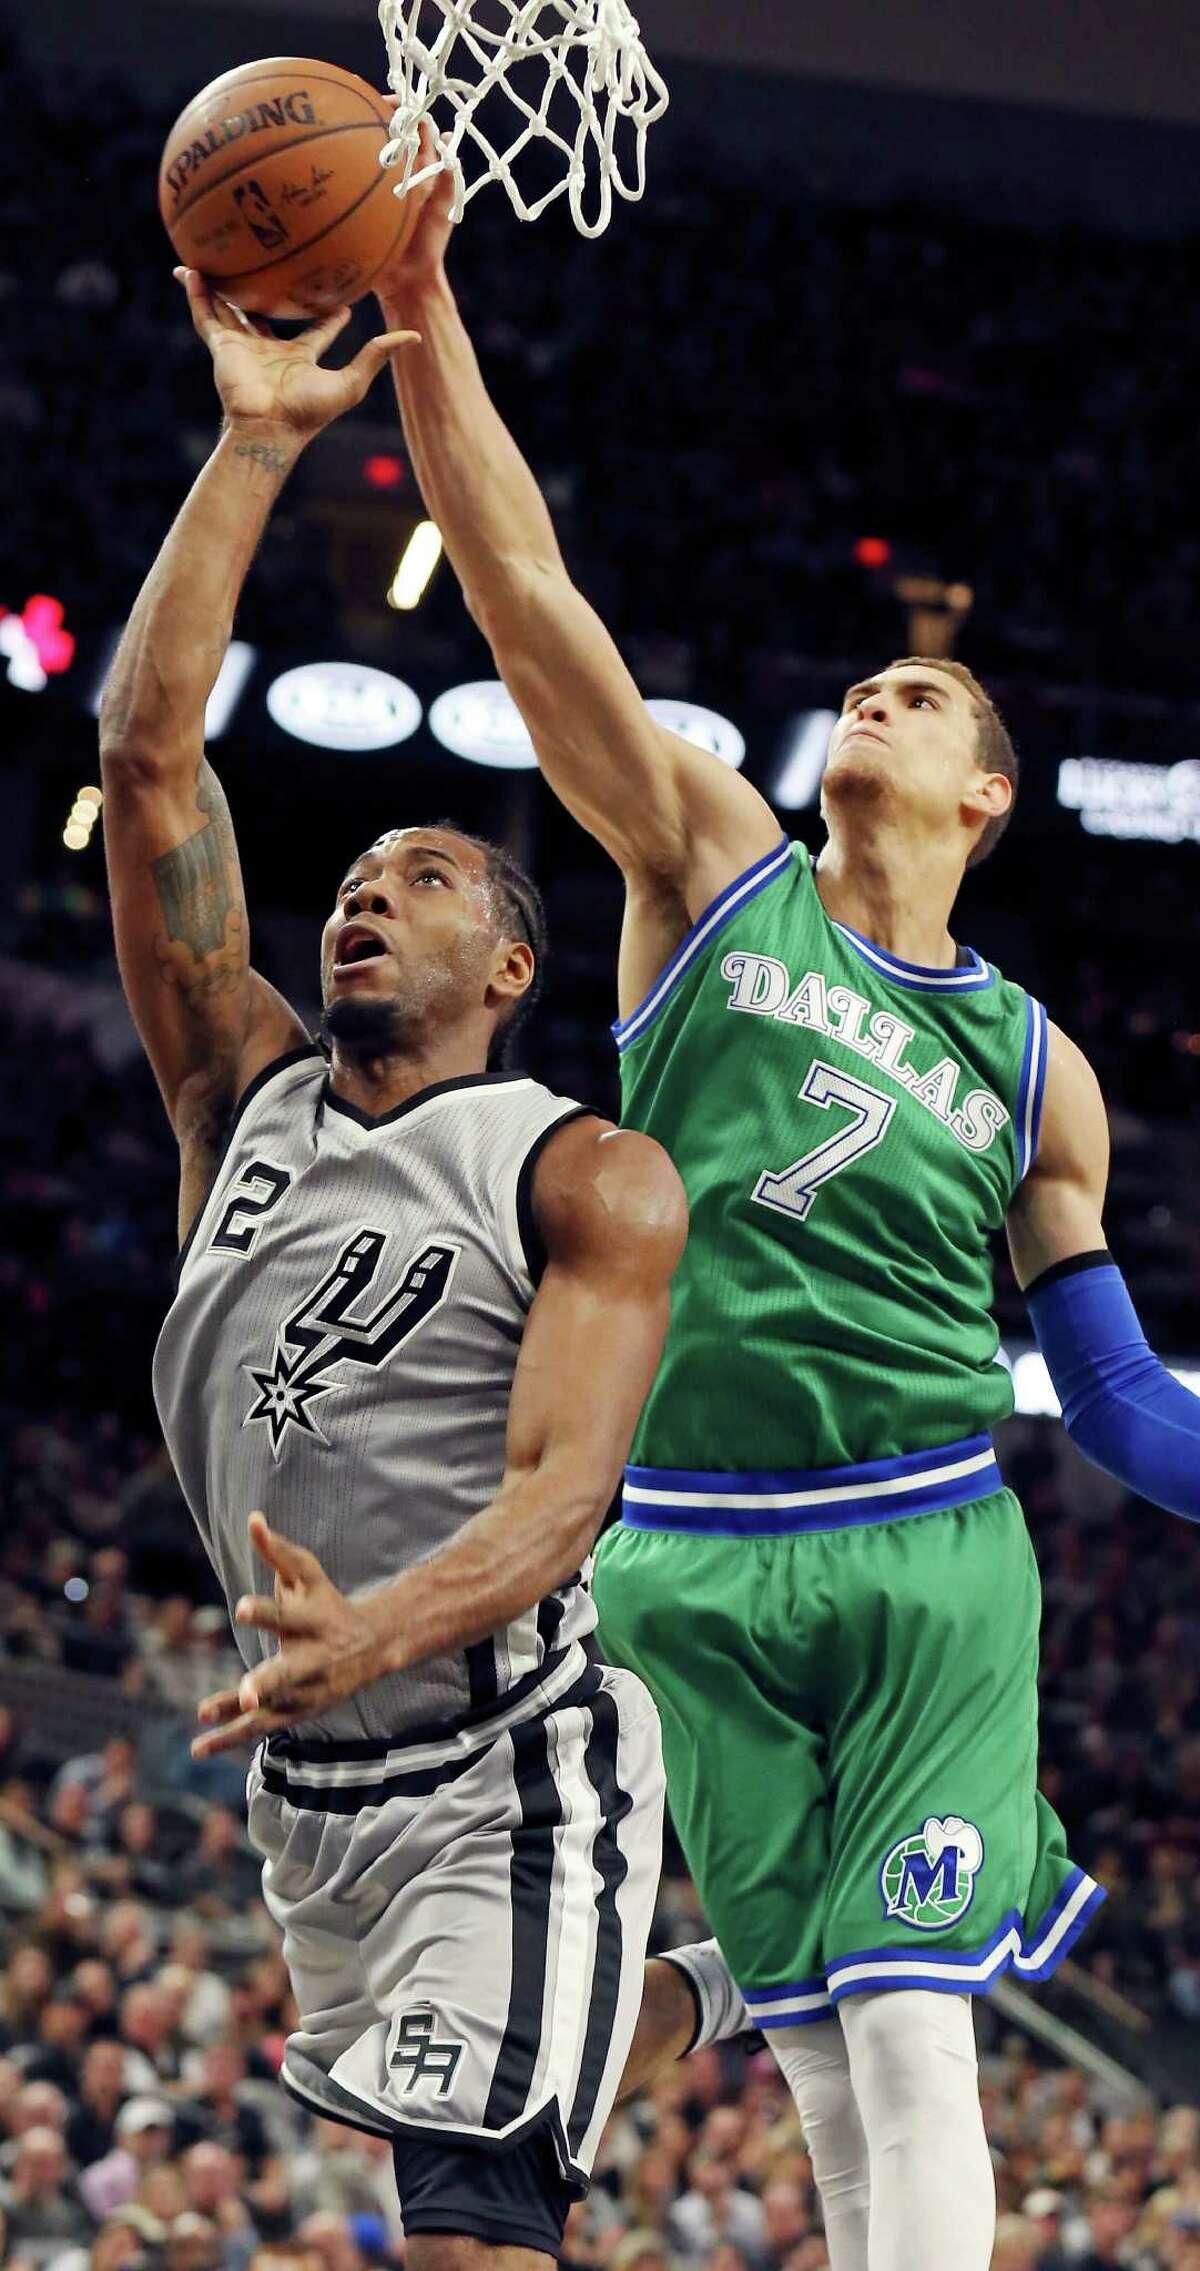 San Antonio Spurs' Kawhi Leonard shoots around Dallas Mavericks' Dwight Powell during first half action Sunday Jan. 17, 2016 at the AT&T Center.